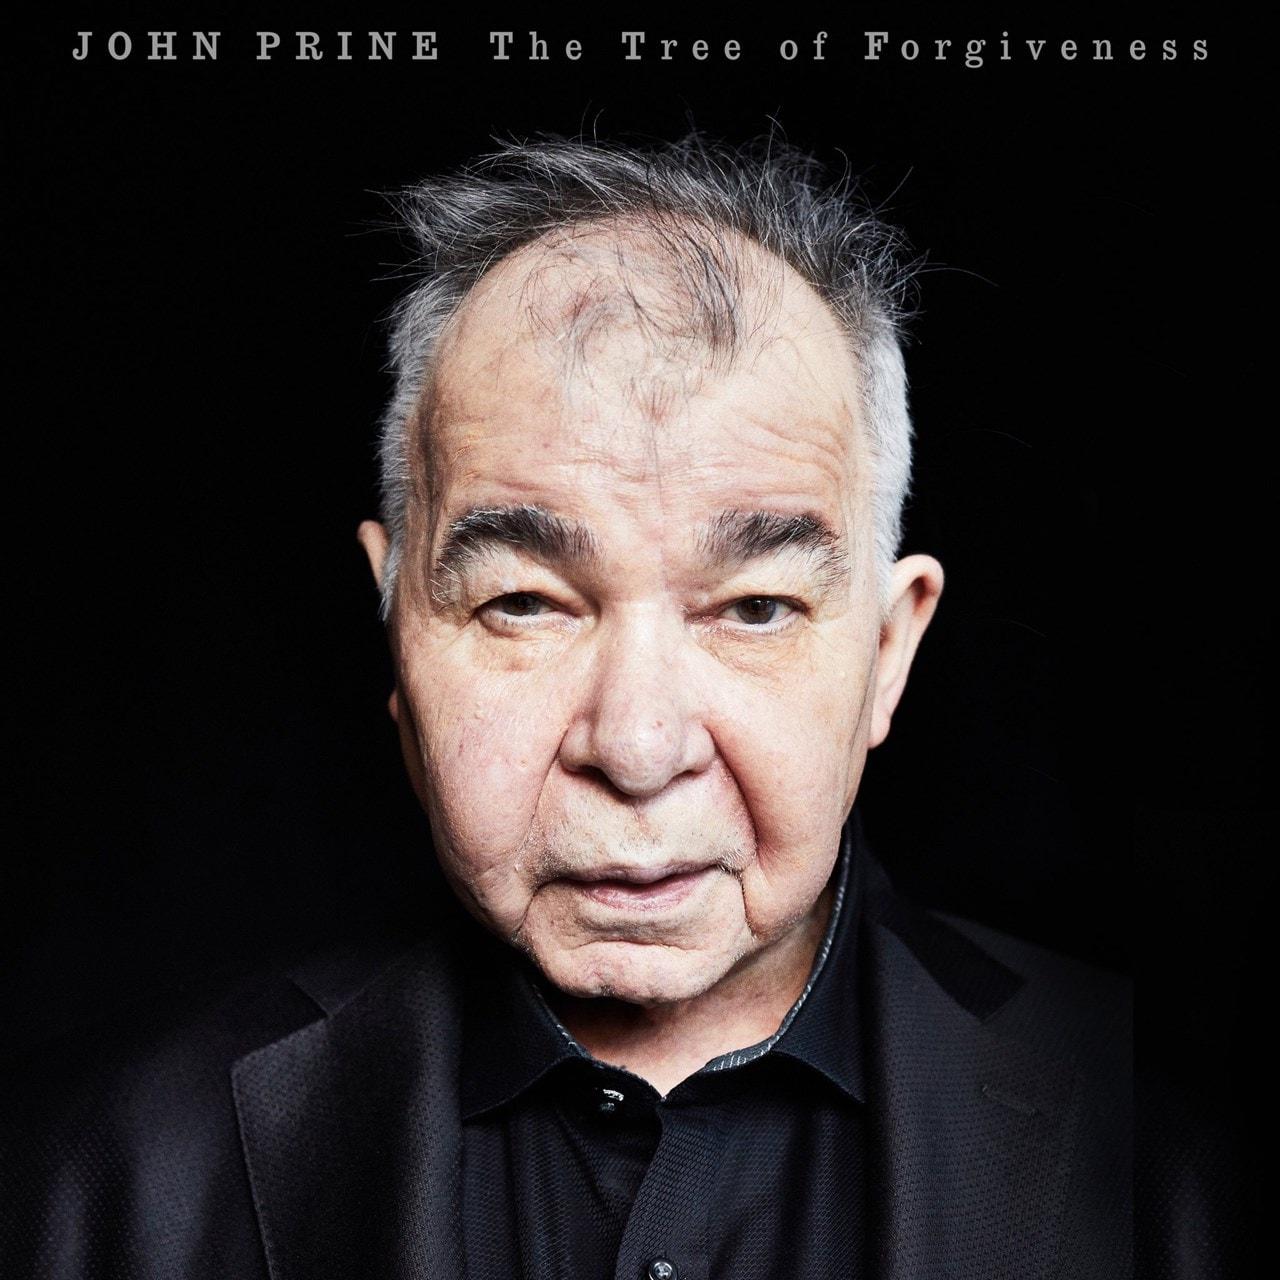 The Tree of Forgiveness - 1